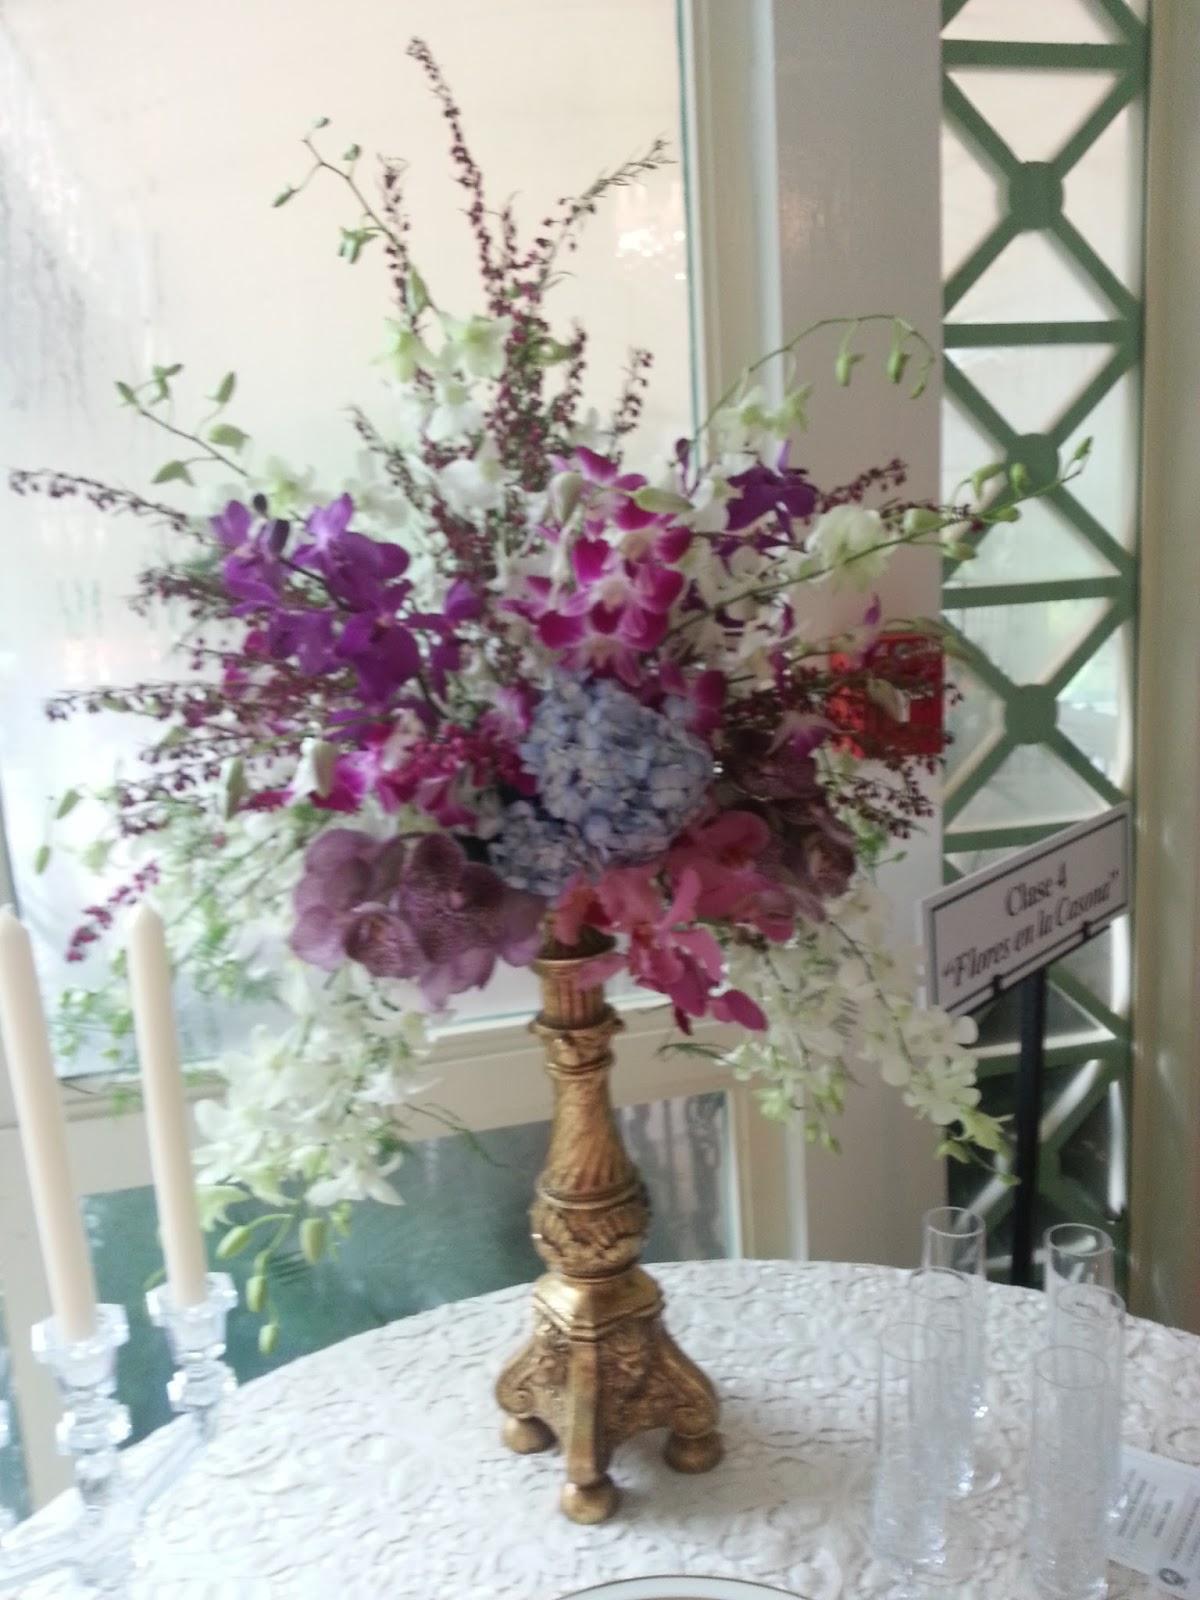 Arreglos florales creativos dise os de mesas - Arreglos florales creativos ...